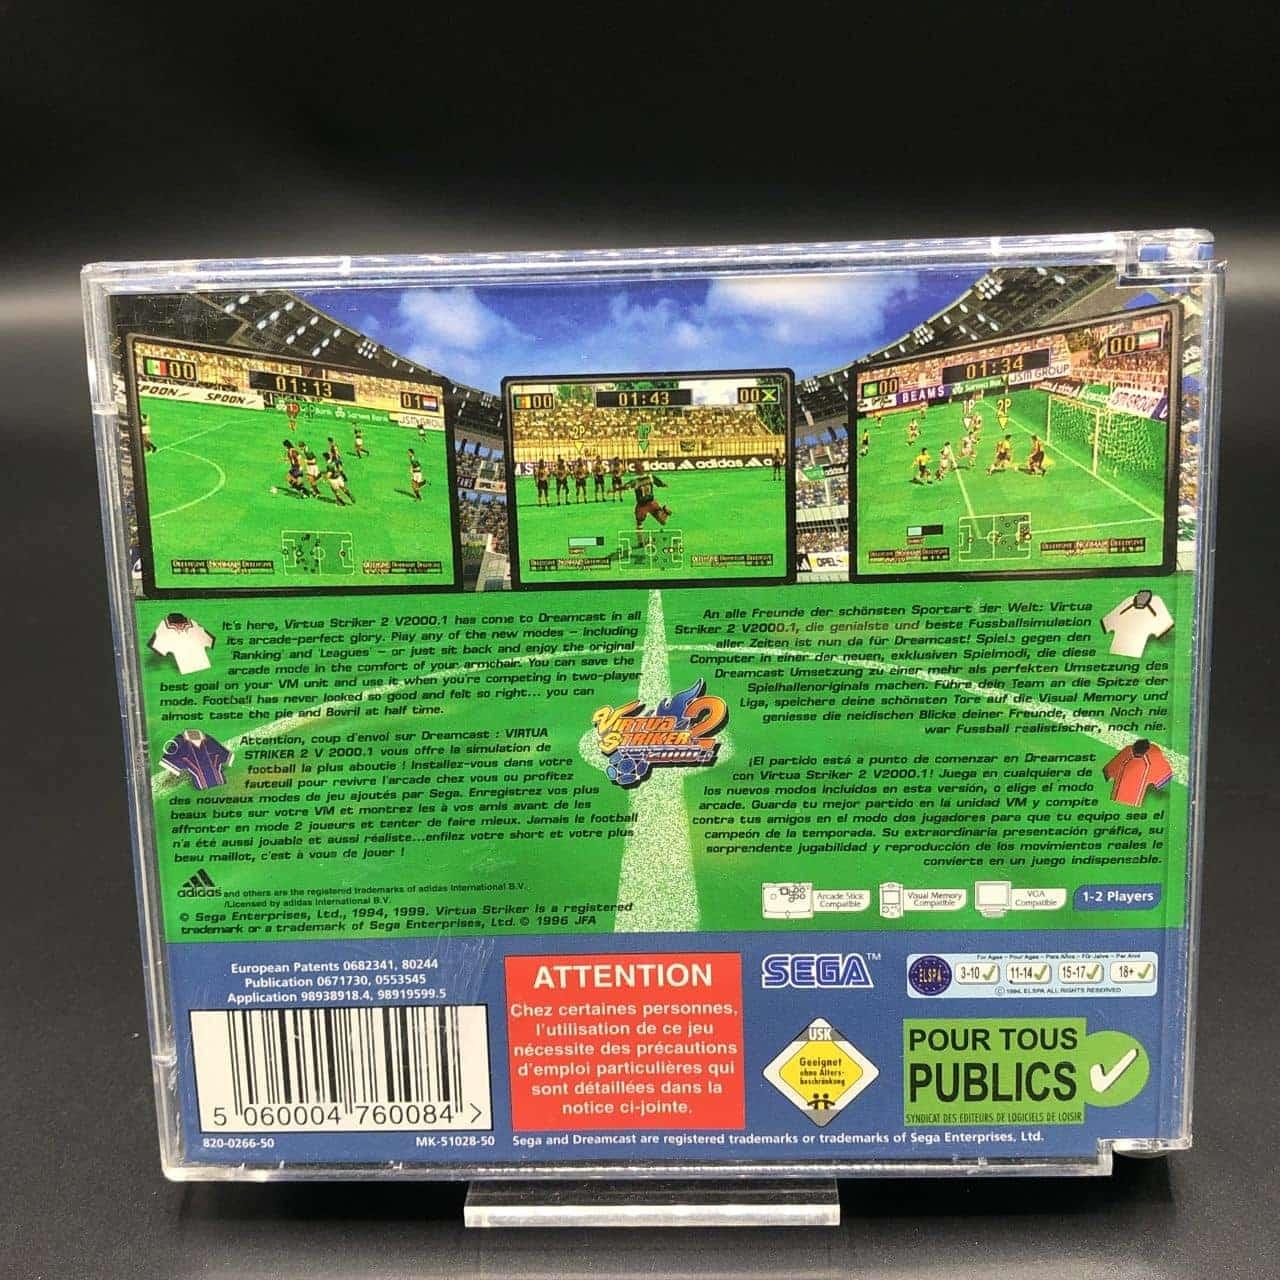 Virtua Striker 2 ver 2000.1 (Komplett) (Gut) Sega Dreamcast